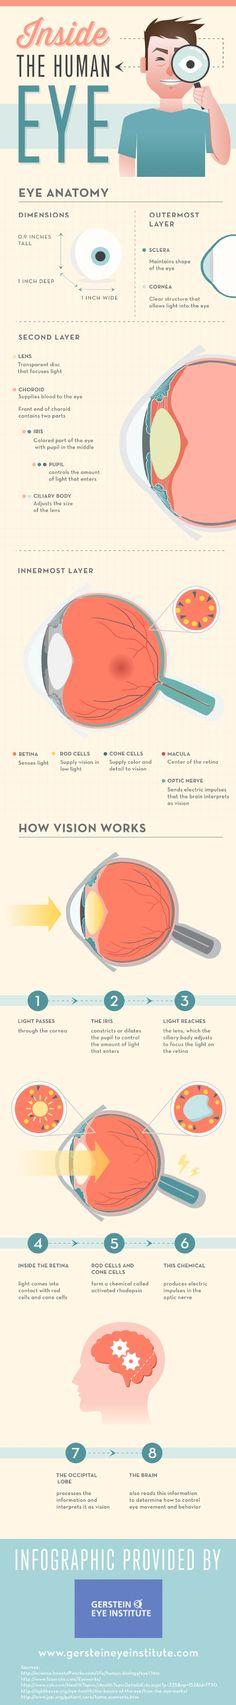 Inside the Human Eye [INFOGRAPHIC]